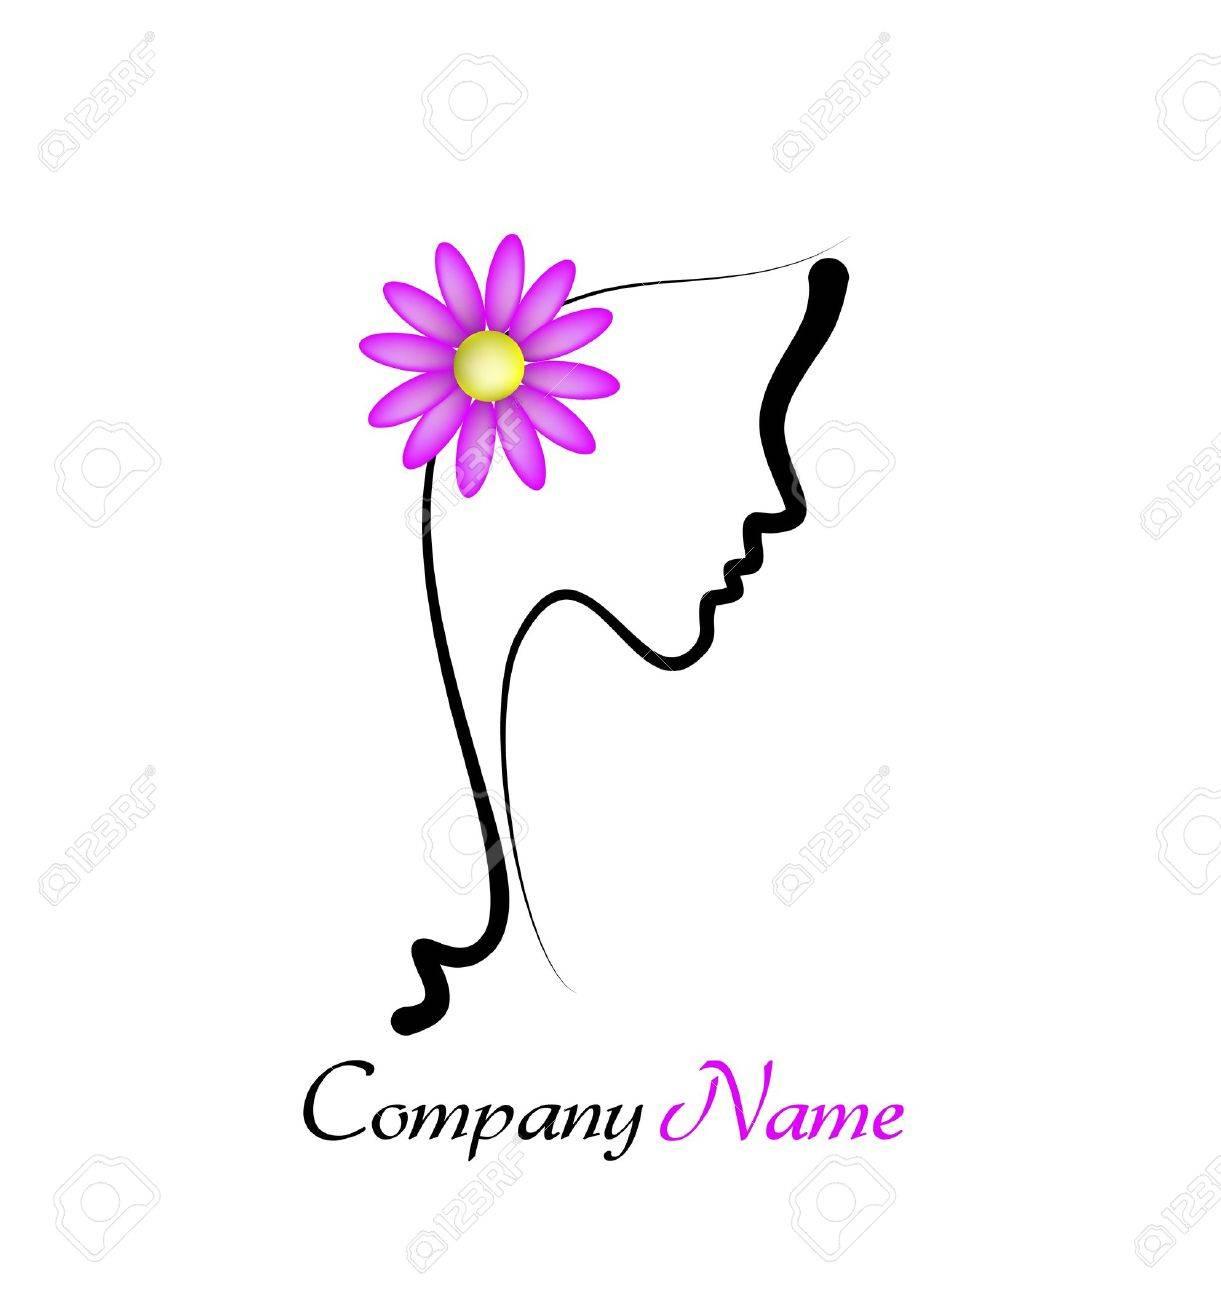 giovane donna - 14173759